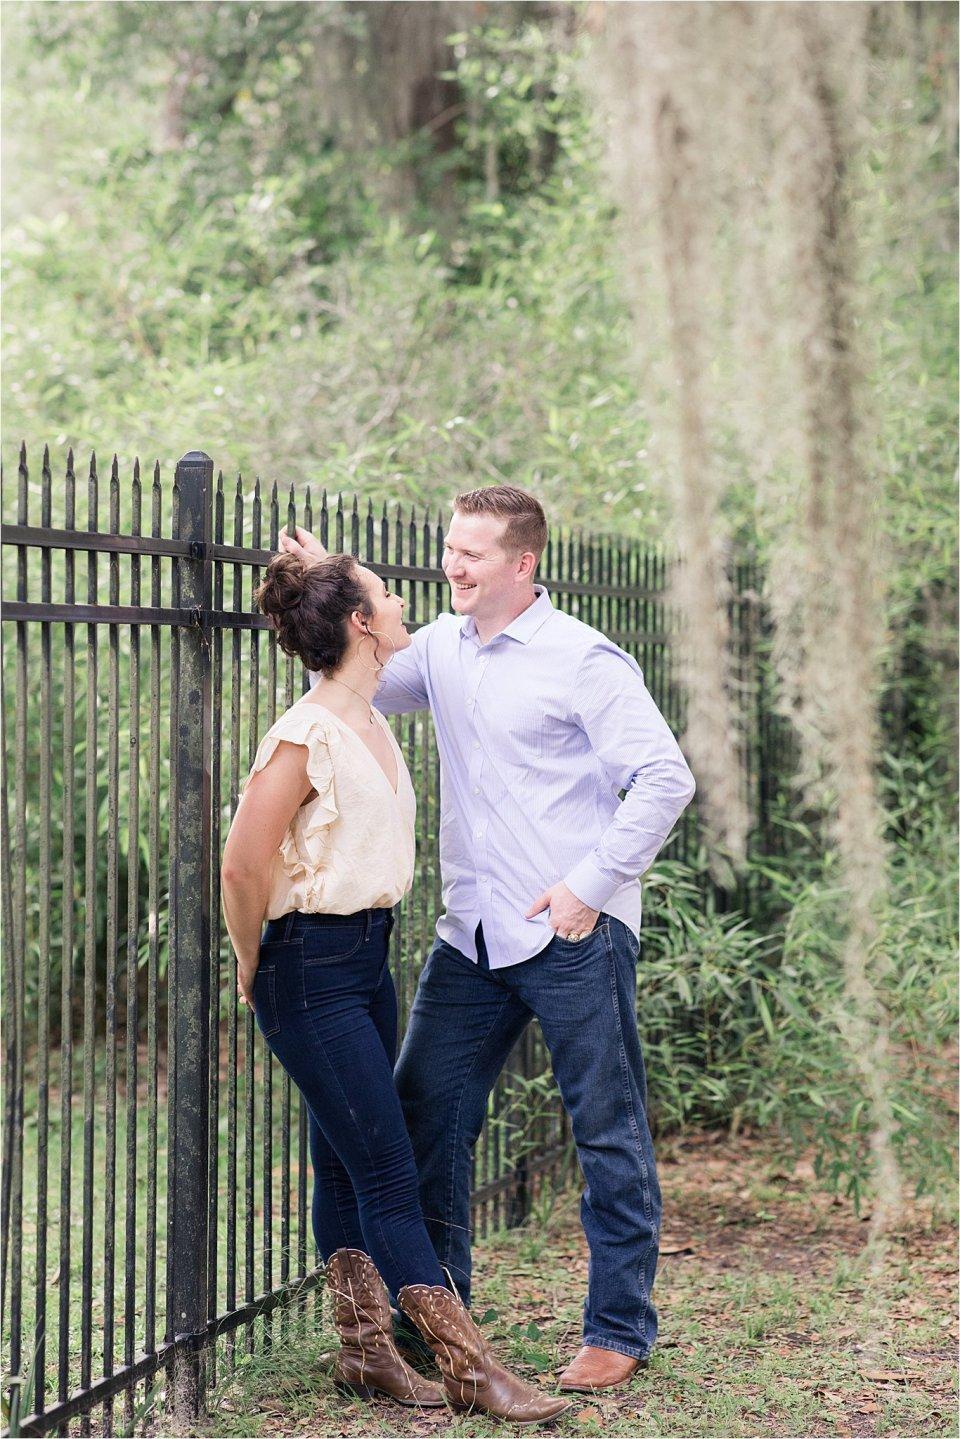 Couple in Wormsloe Plantation in Savannah, GA by destination photographer Karen Shoufler